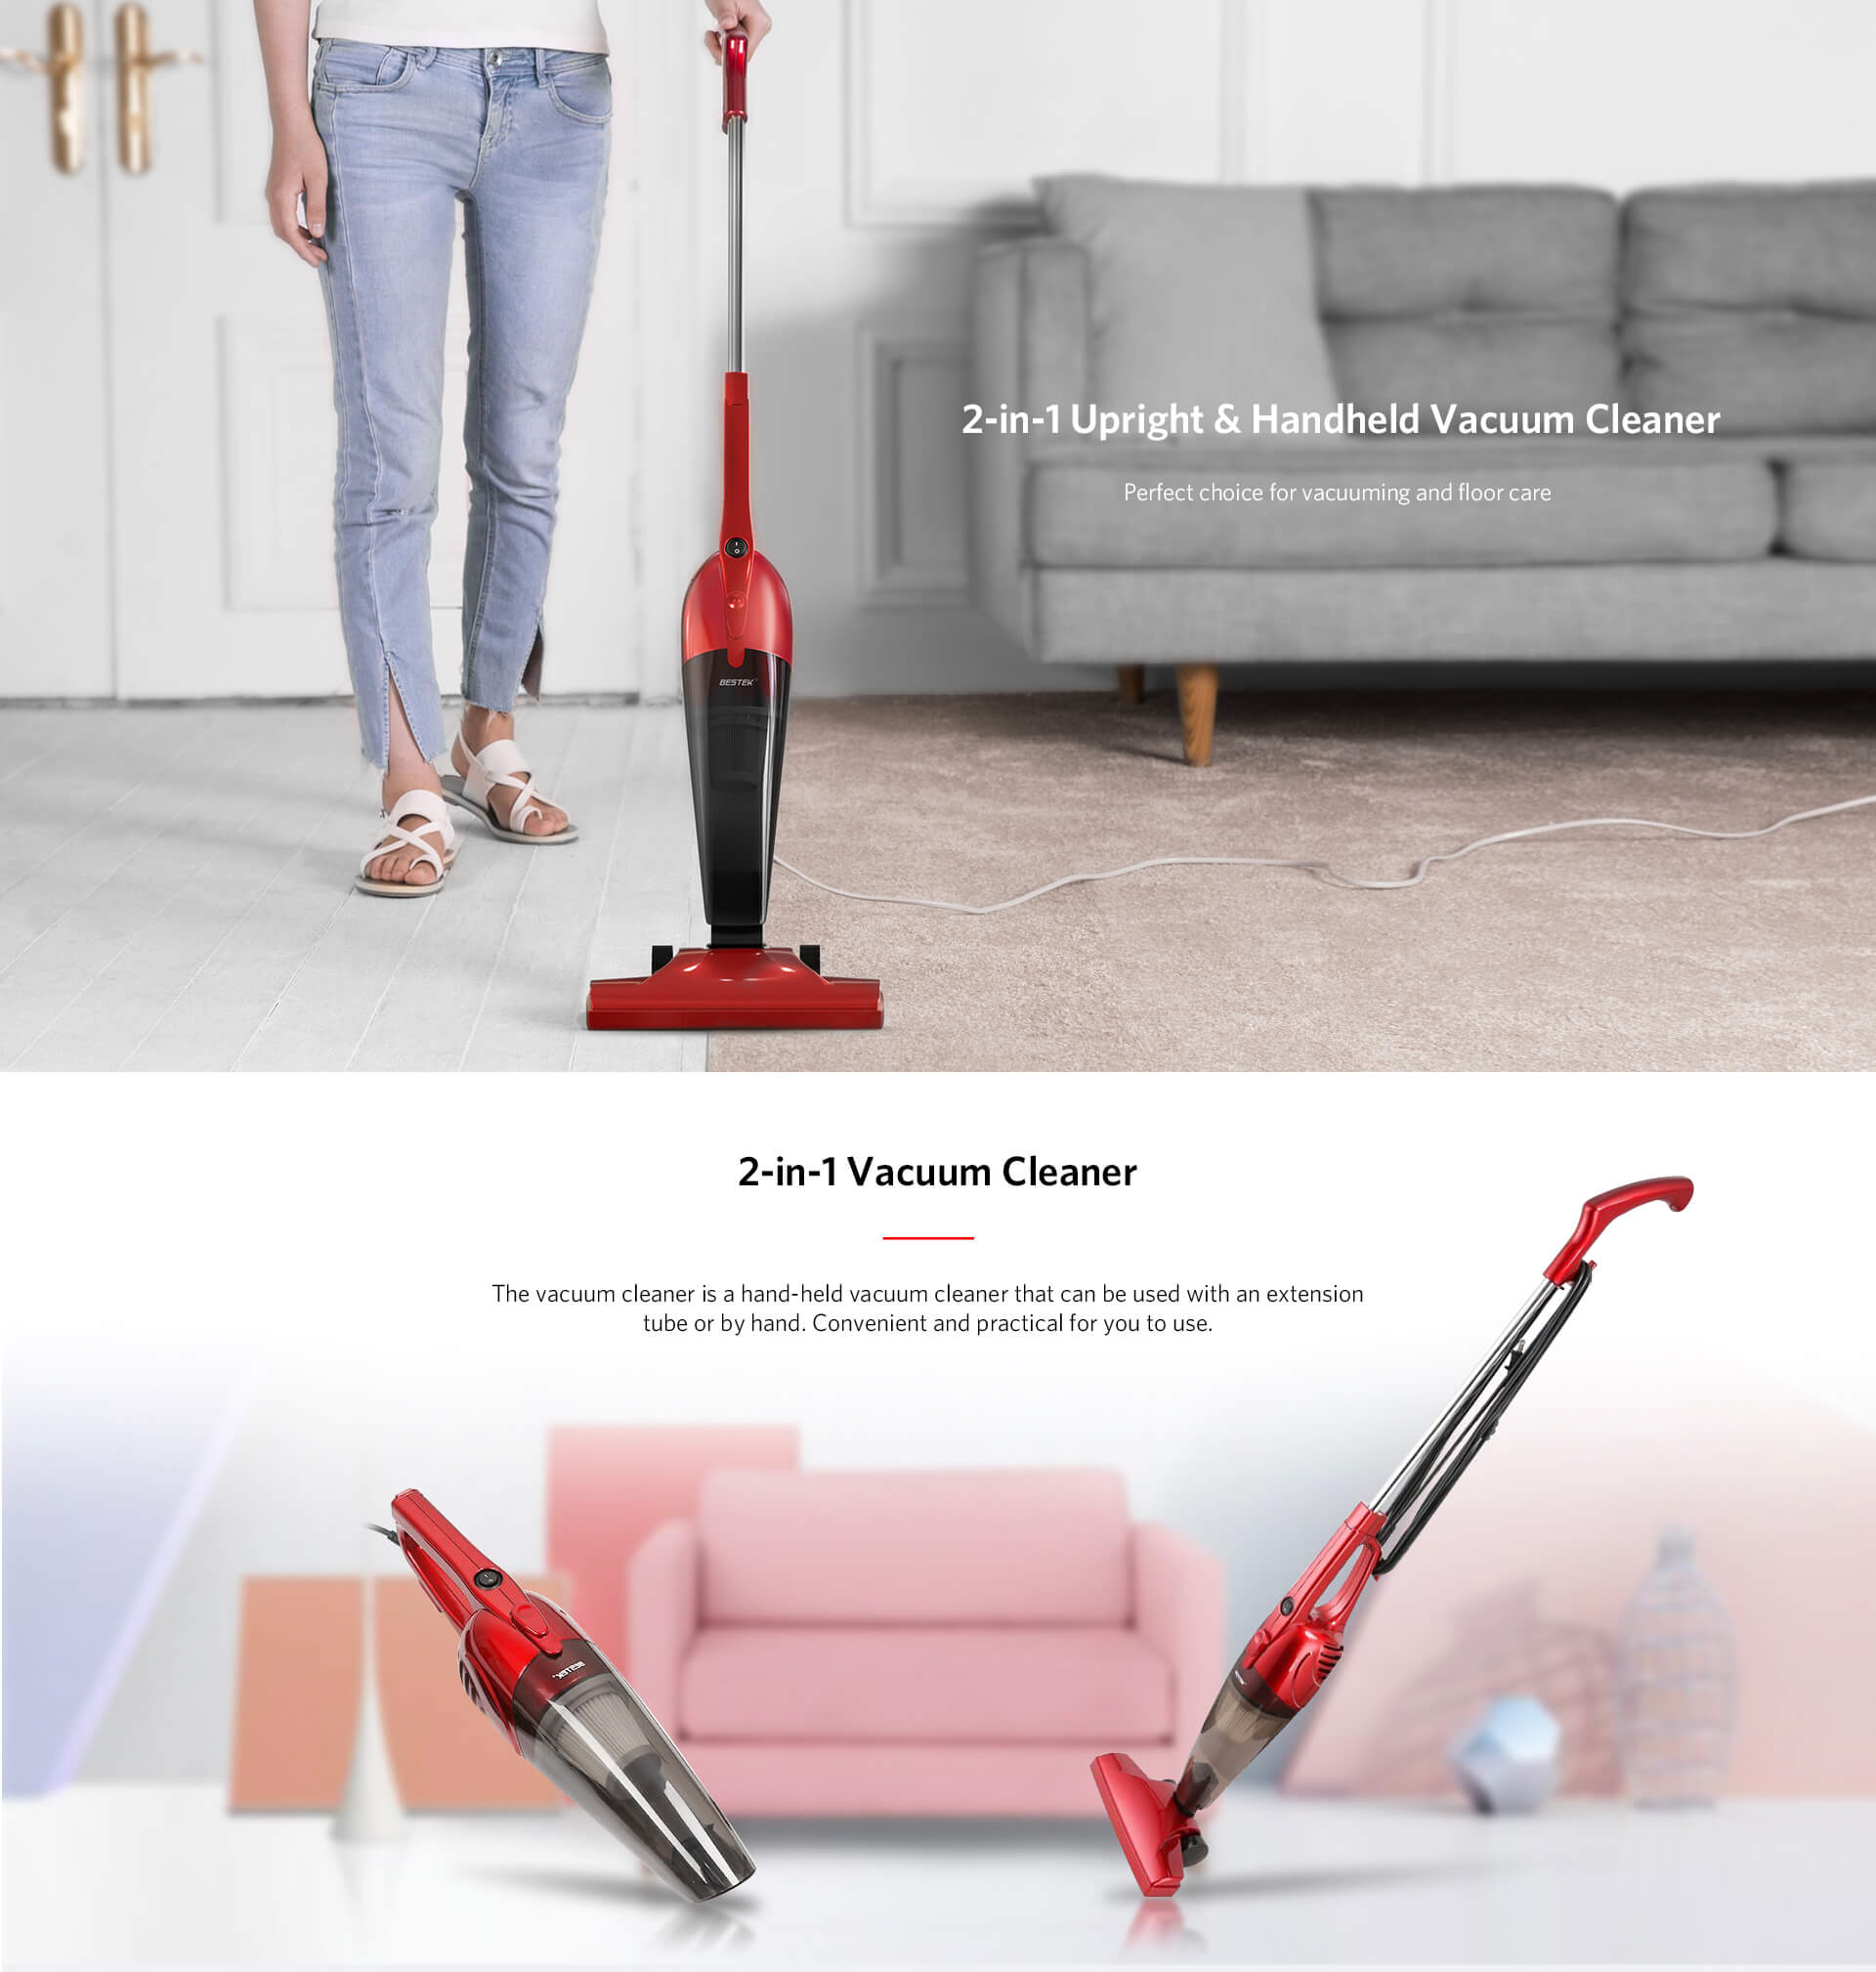 bestek vacuum cleaner 2 in 1 corded upright stick and handheld vacuum cleaners 6950334949817 ebay. Black Bedroom Furniture Sets. Home Design Ideas